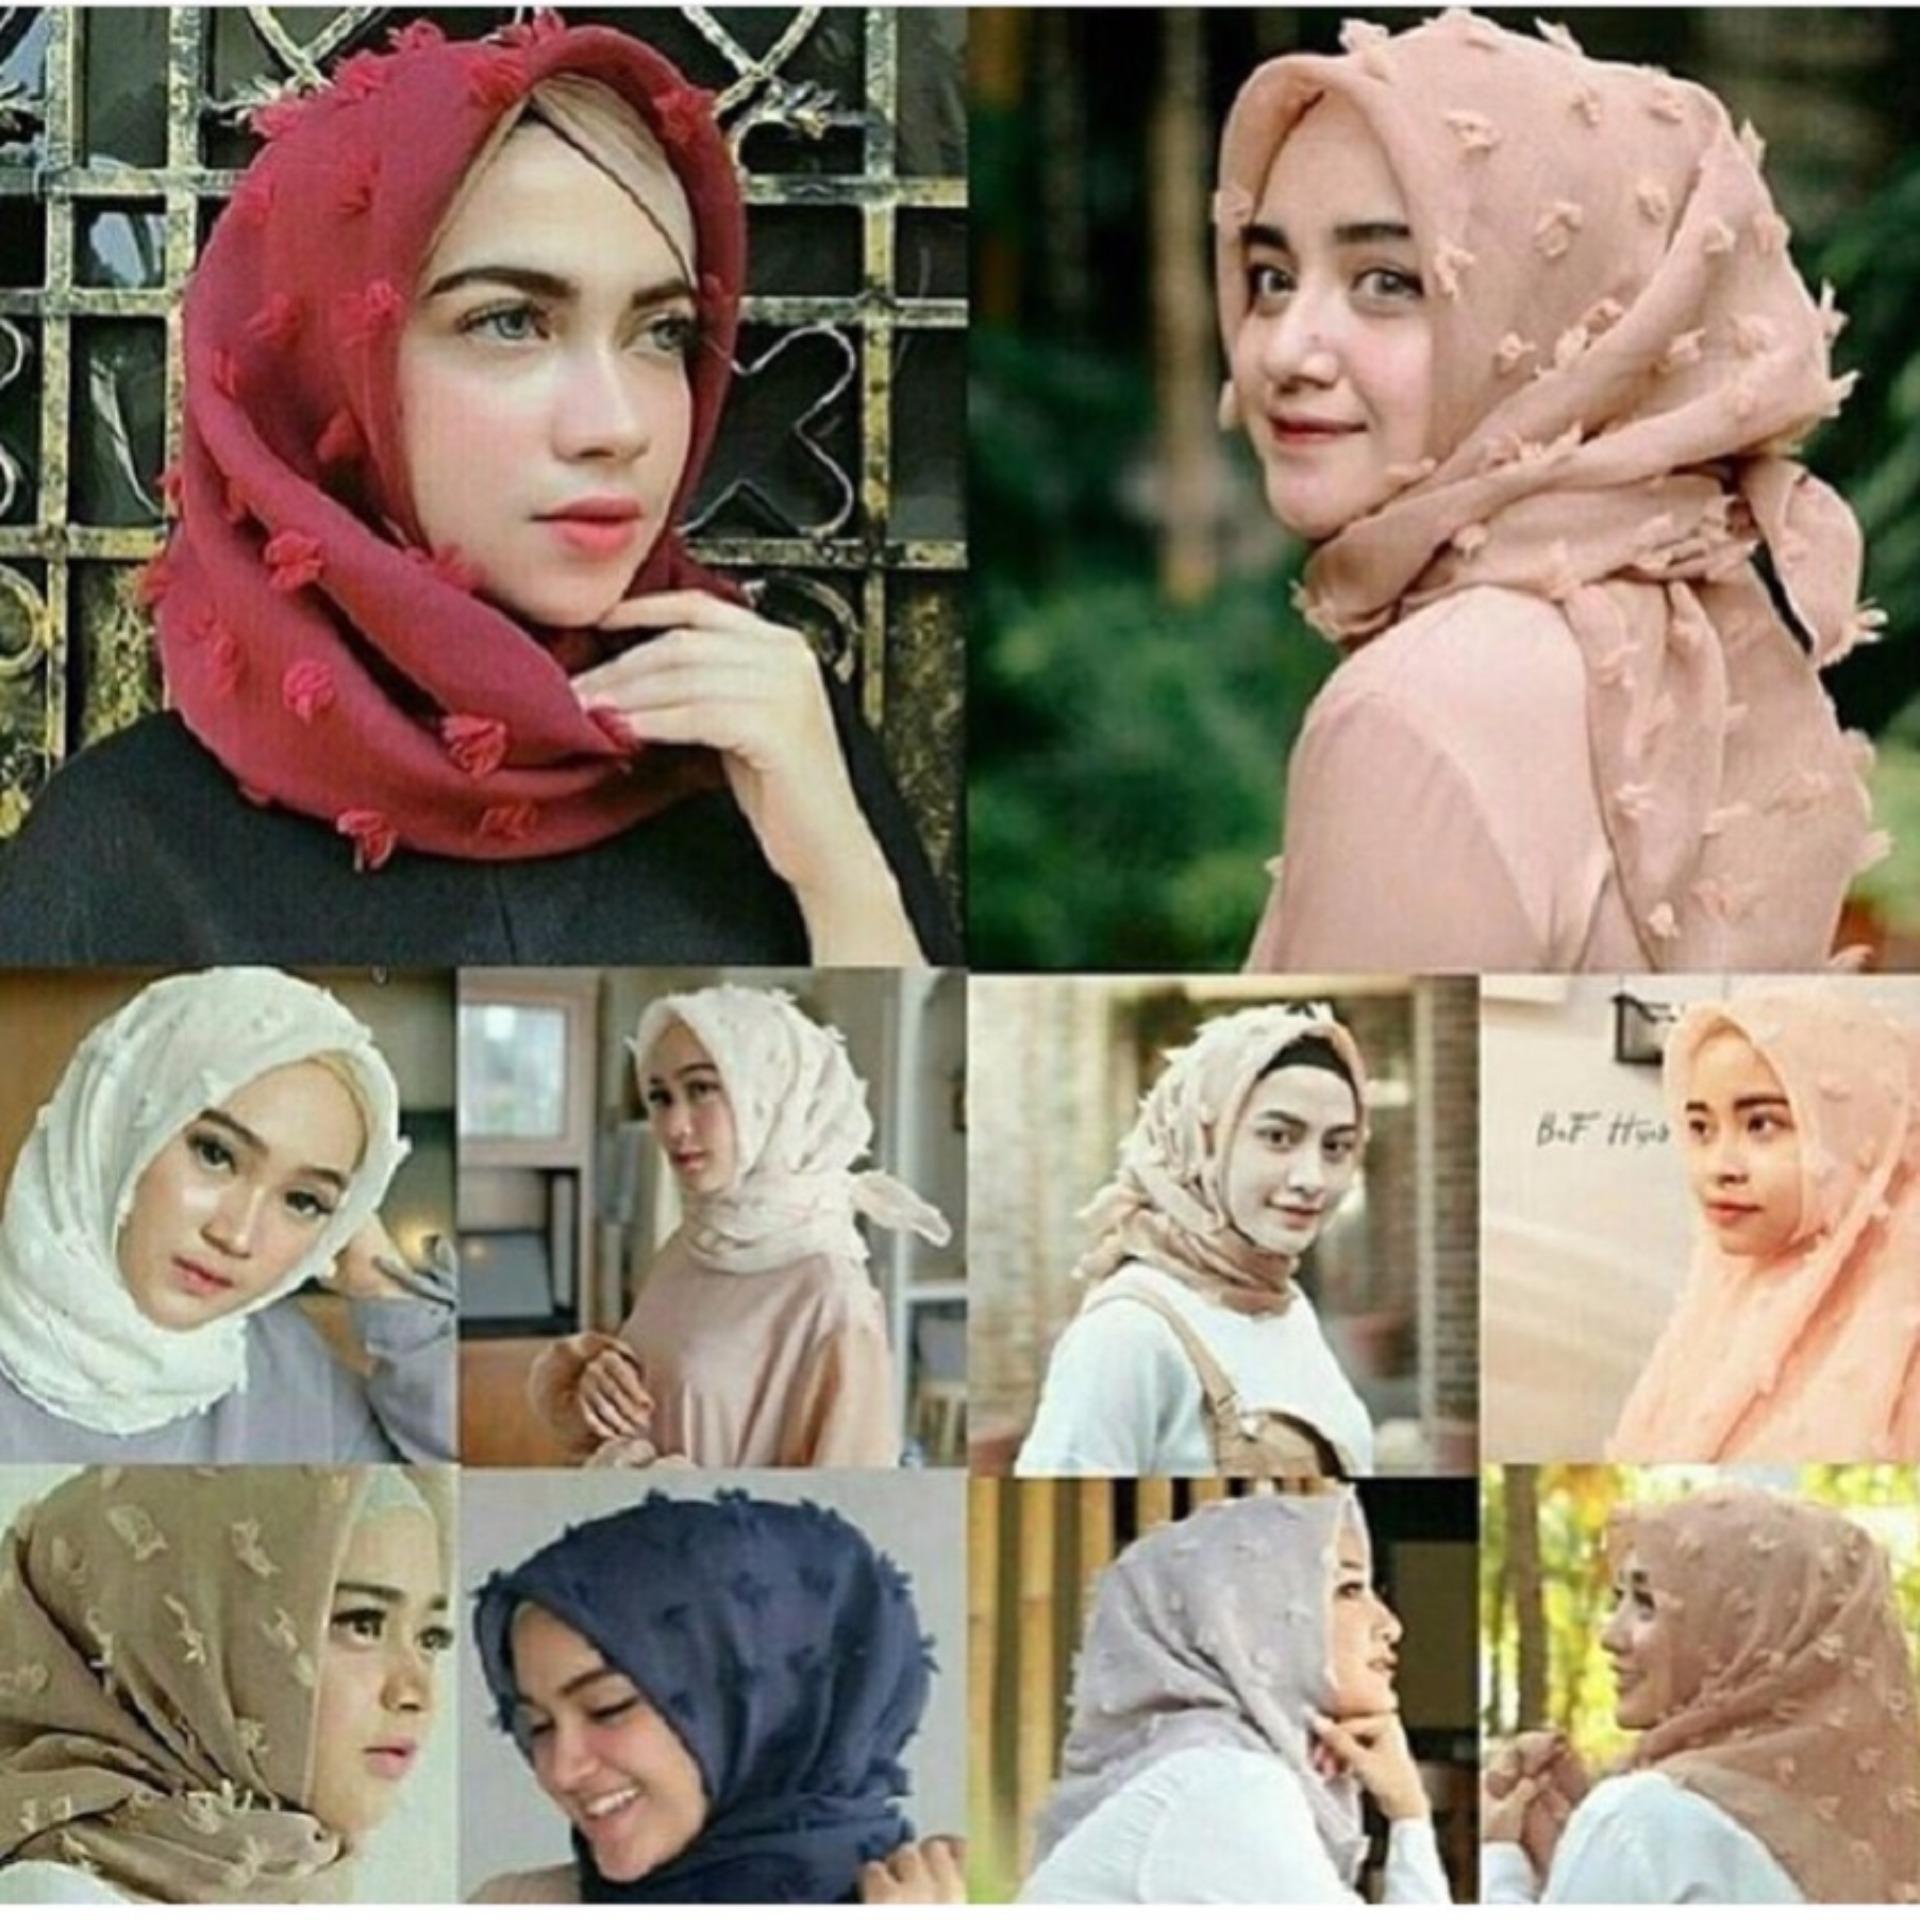 Beli Hemat Harga Diskon Jilbab Khimar Dhea Info Barang Ukuran 110x110 Cm Hijab Feather Square Kerudung Segiempat Organza Linen Rubiah